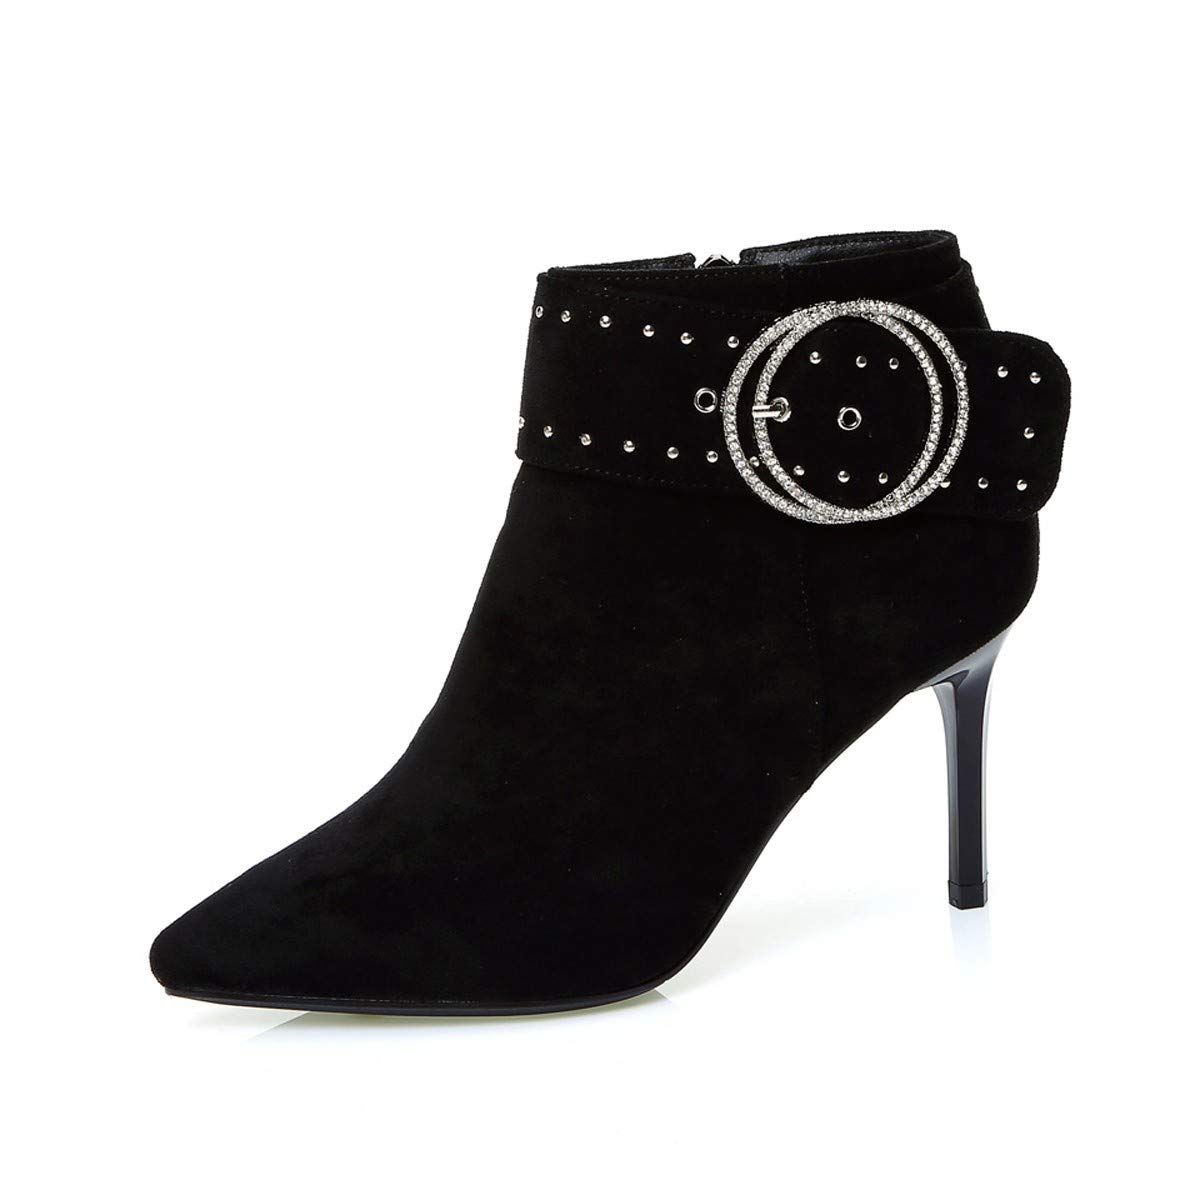 LBTSQ-Gürtelschnallen Nieten Fashion Tops Spitze 8Cm High Heels High Heels Reißverschlüsse Martin Stiefel Schuhe